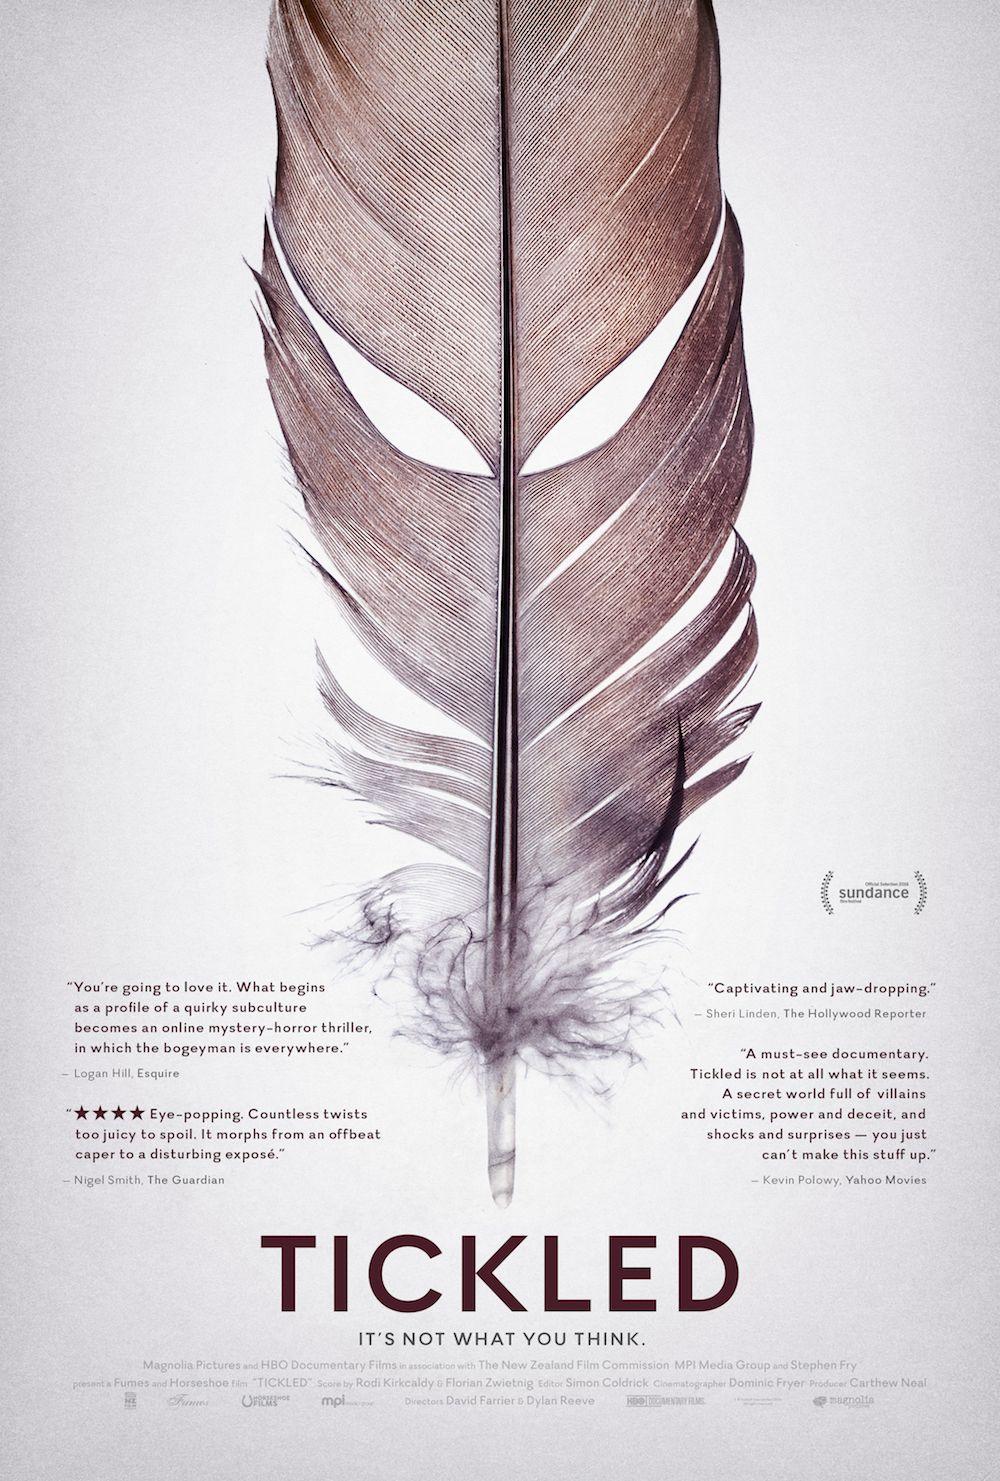 Strange Documentary Tickled Gets A Trailer Film Pulse Tickled Movie Tickled Documentary Documentaries